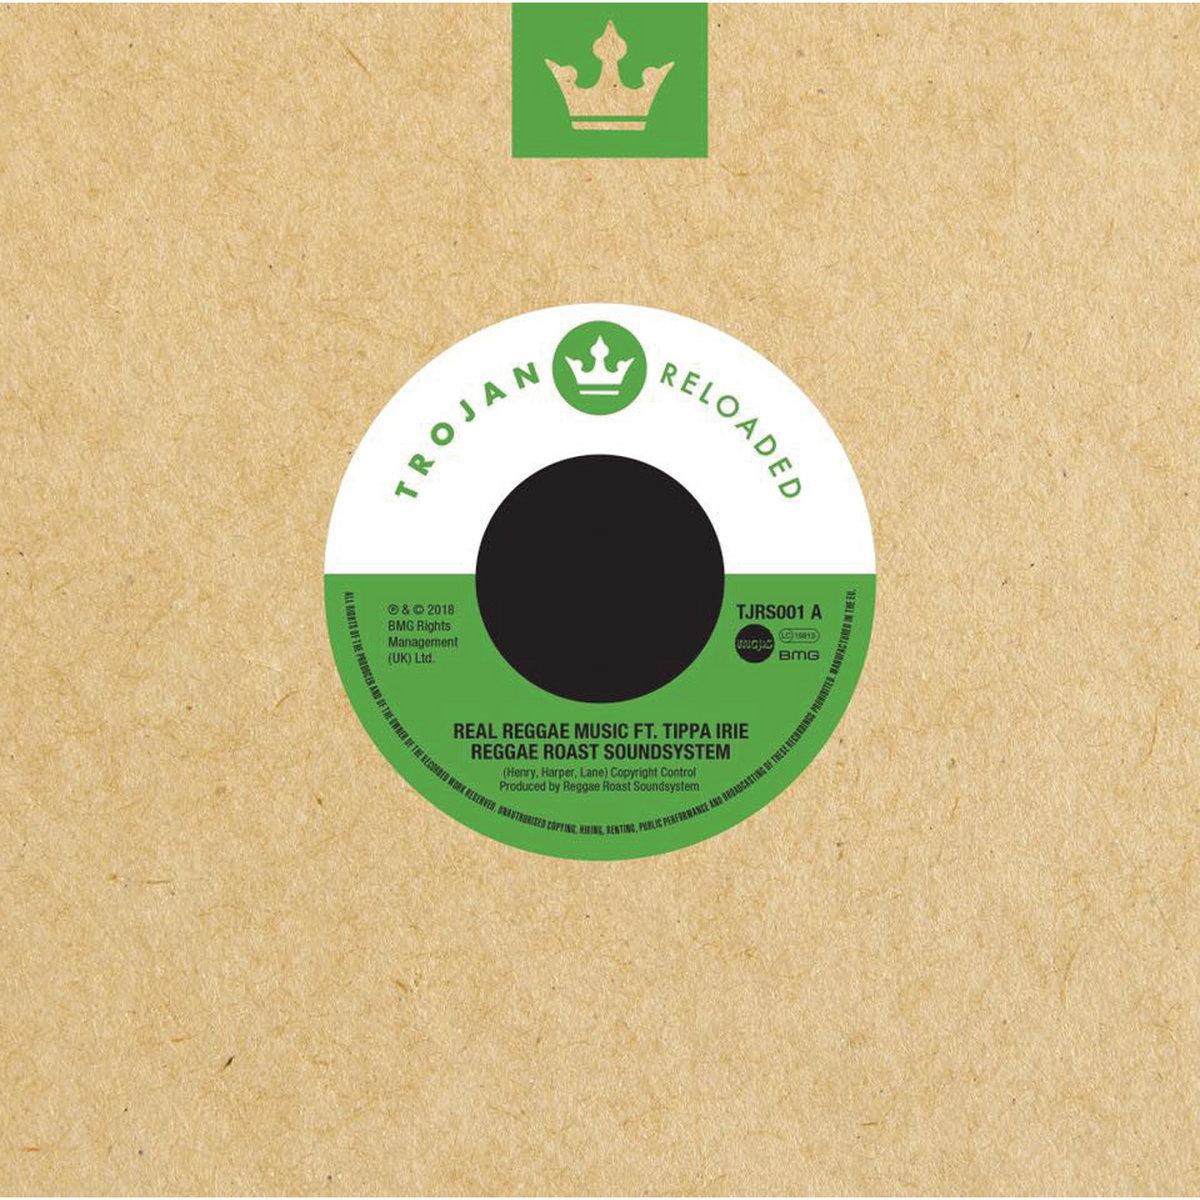 Real Reggae Music Feat Tippa Irie Reggae Roast